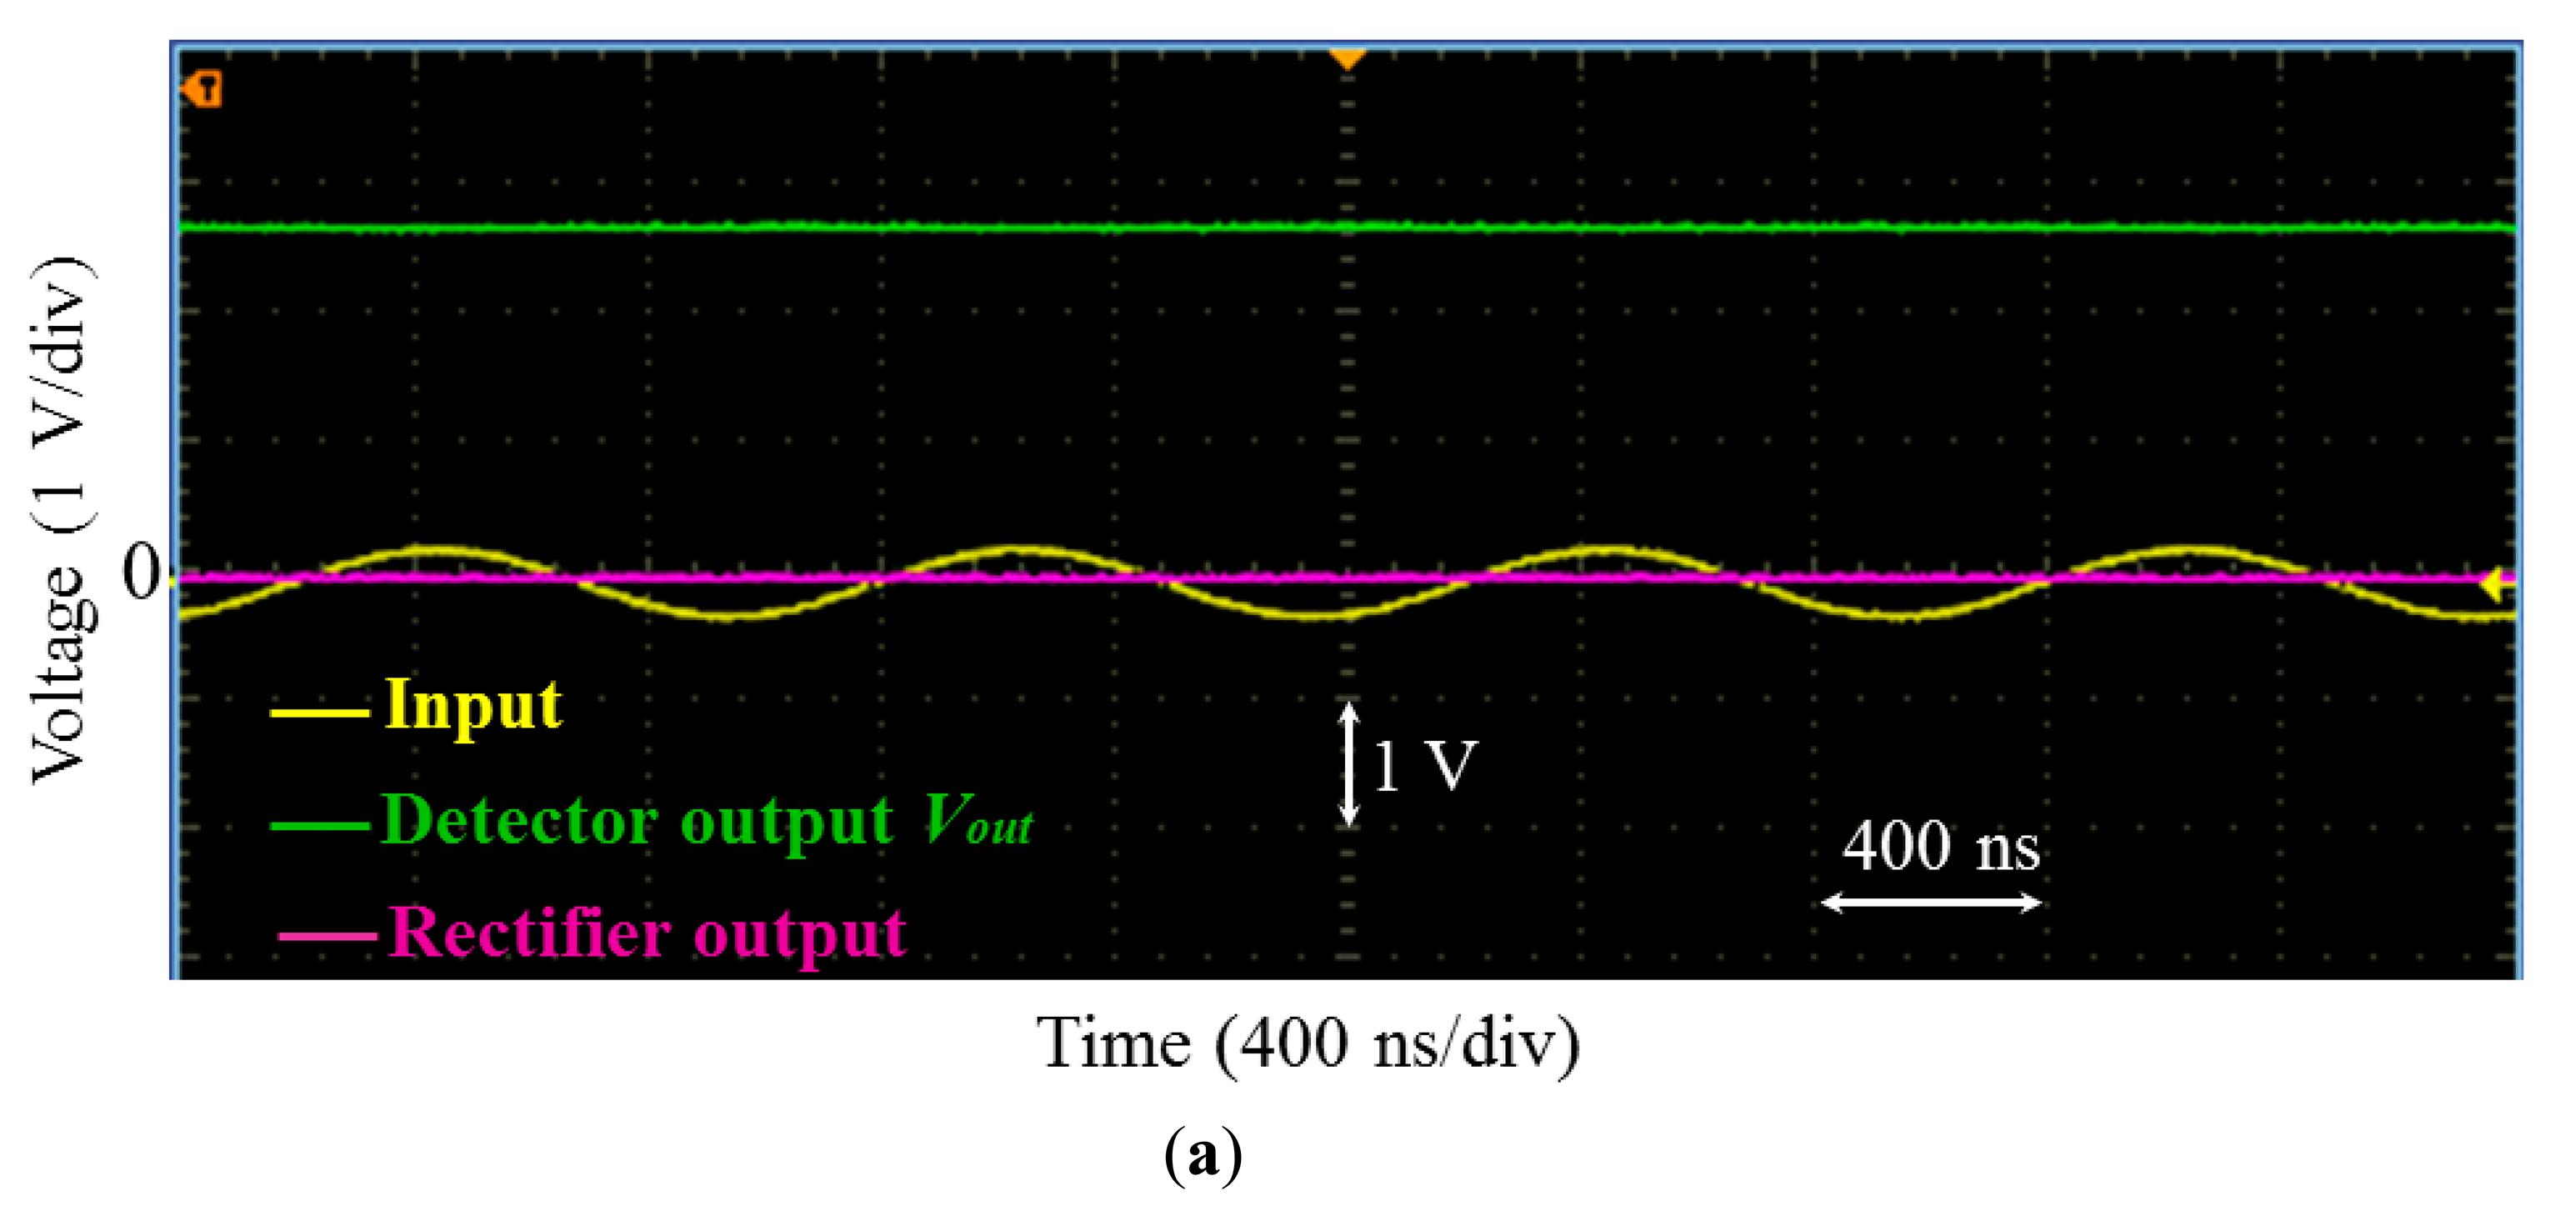 Sensors Free FullText High Frequency Amplitude  3091 x 1453 png sensors-14-24502f8a.png